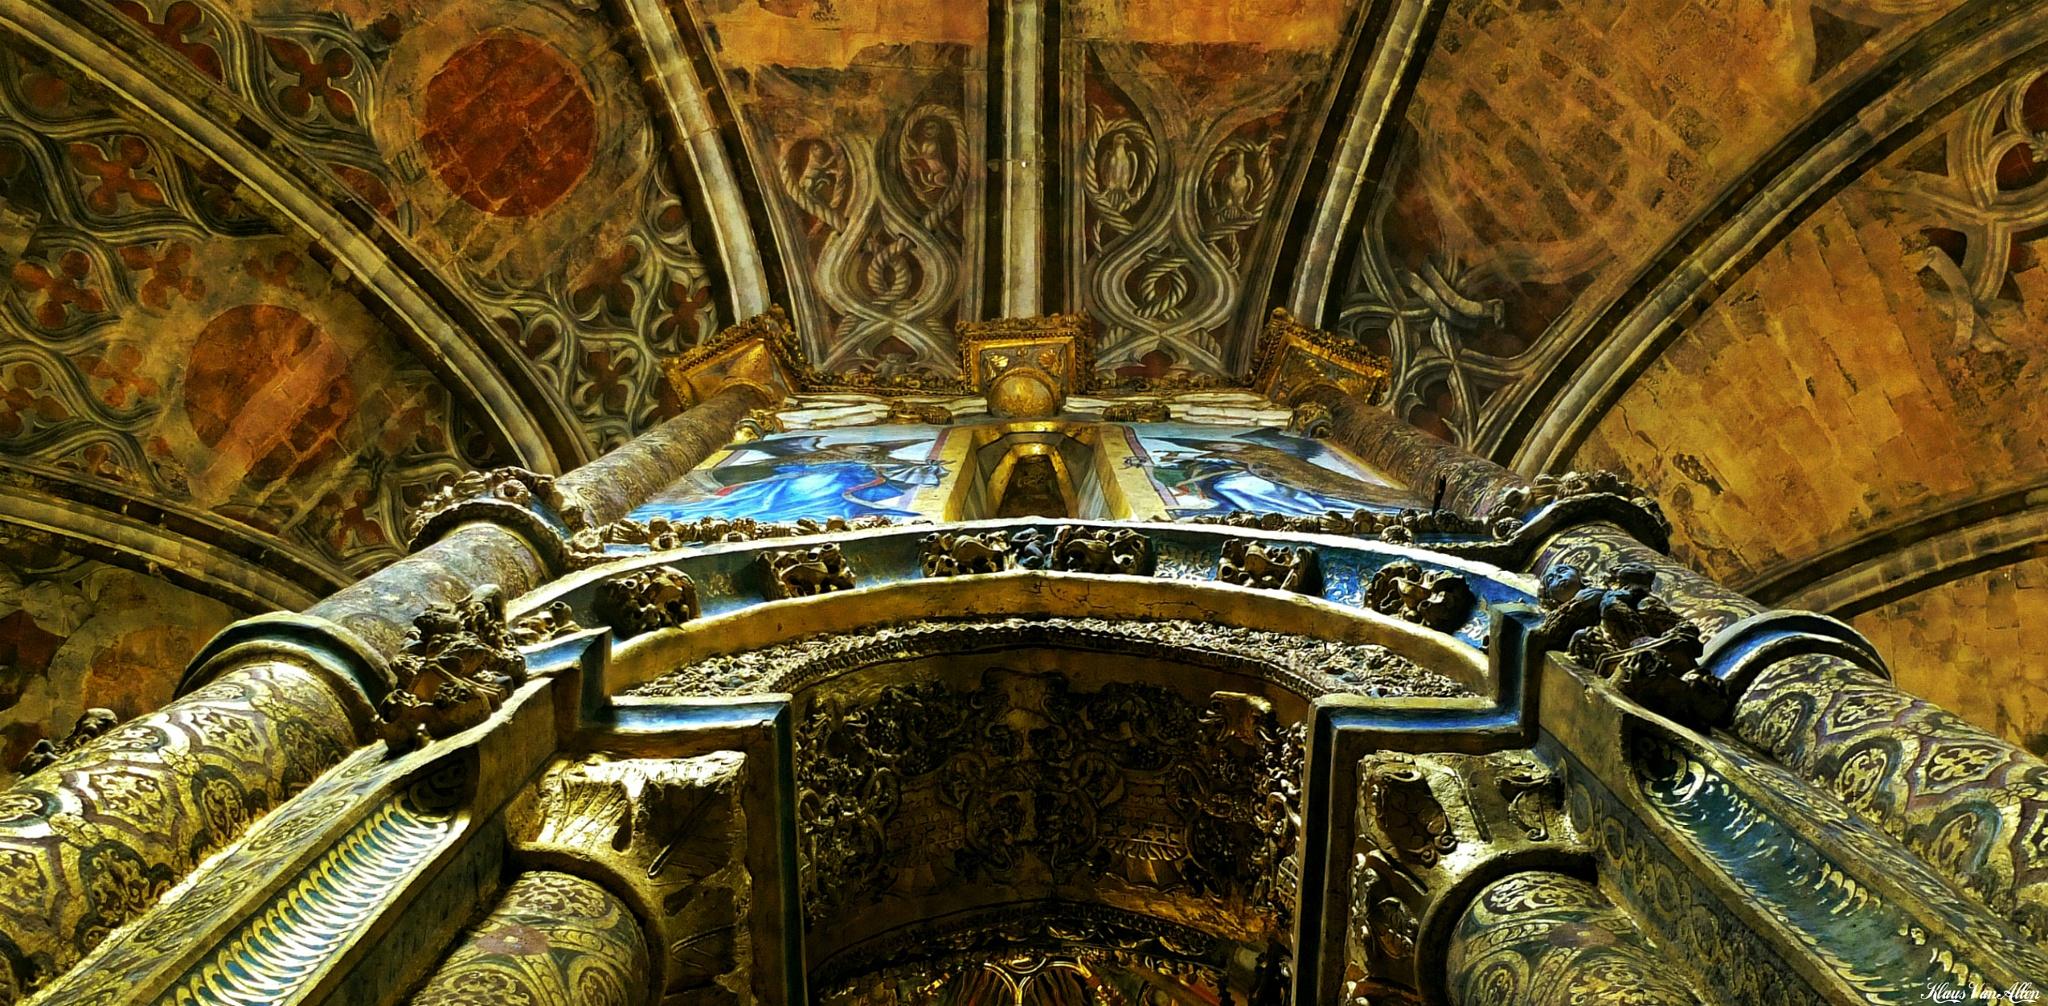 Monte Cristo convent by Klaus Van Allen